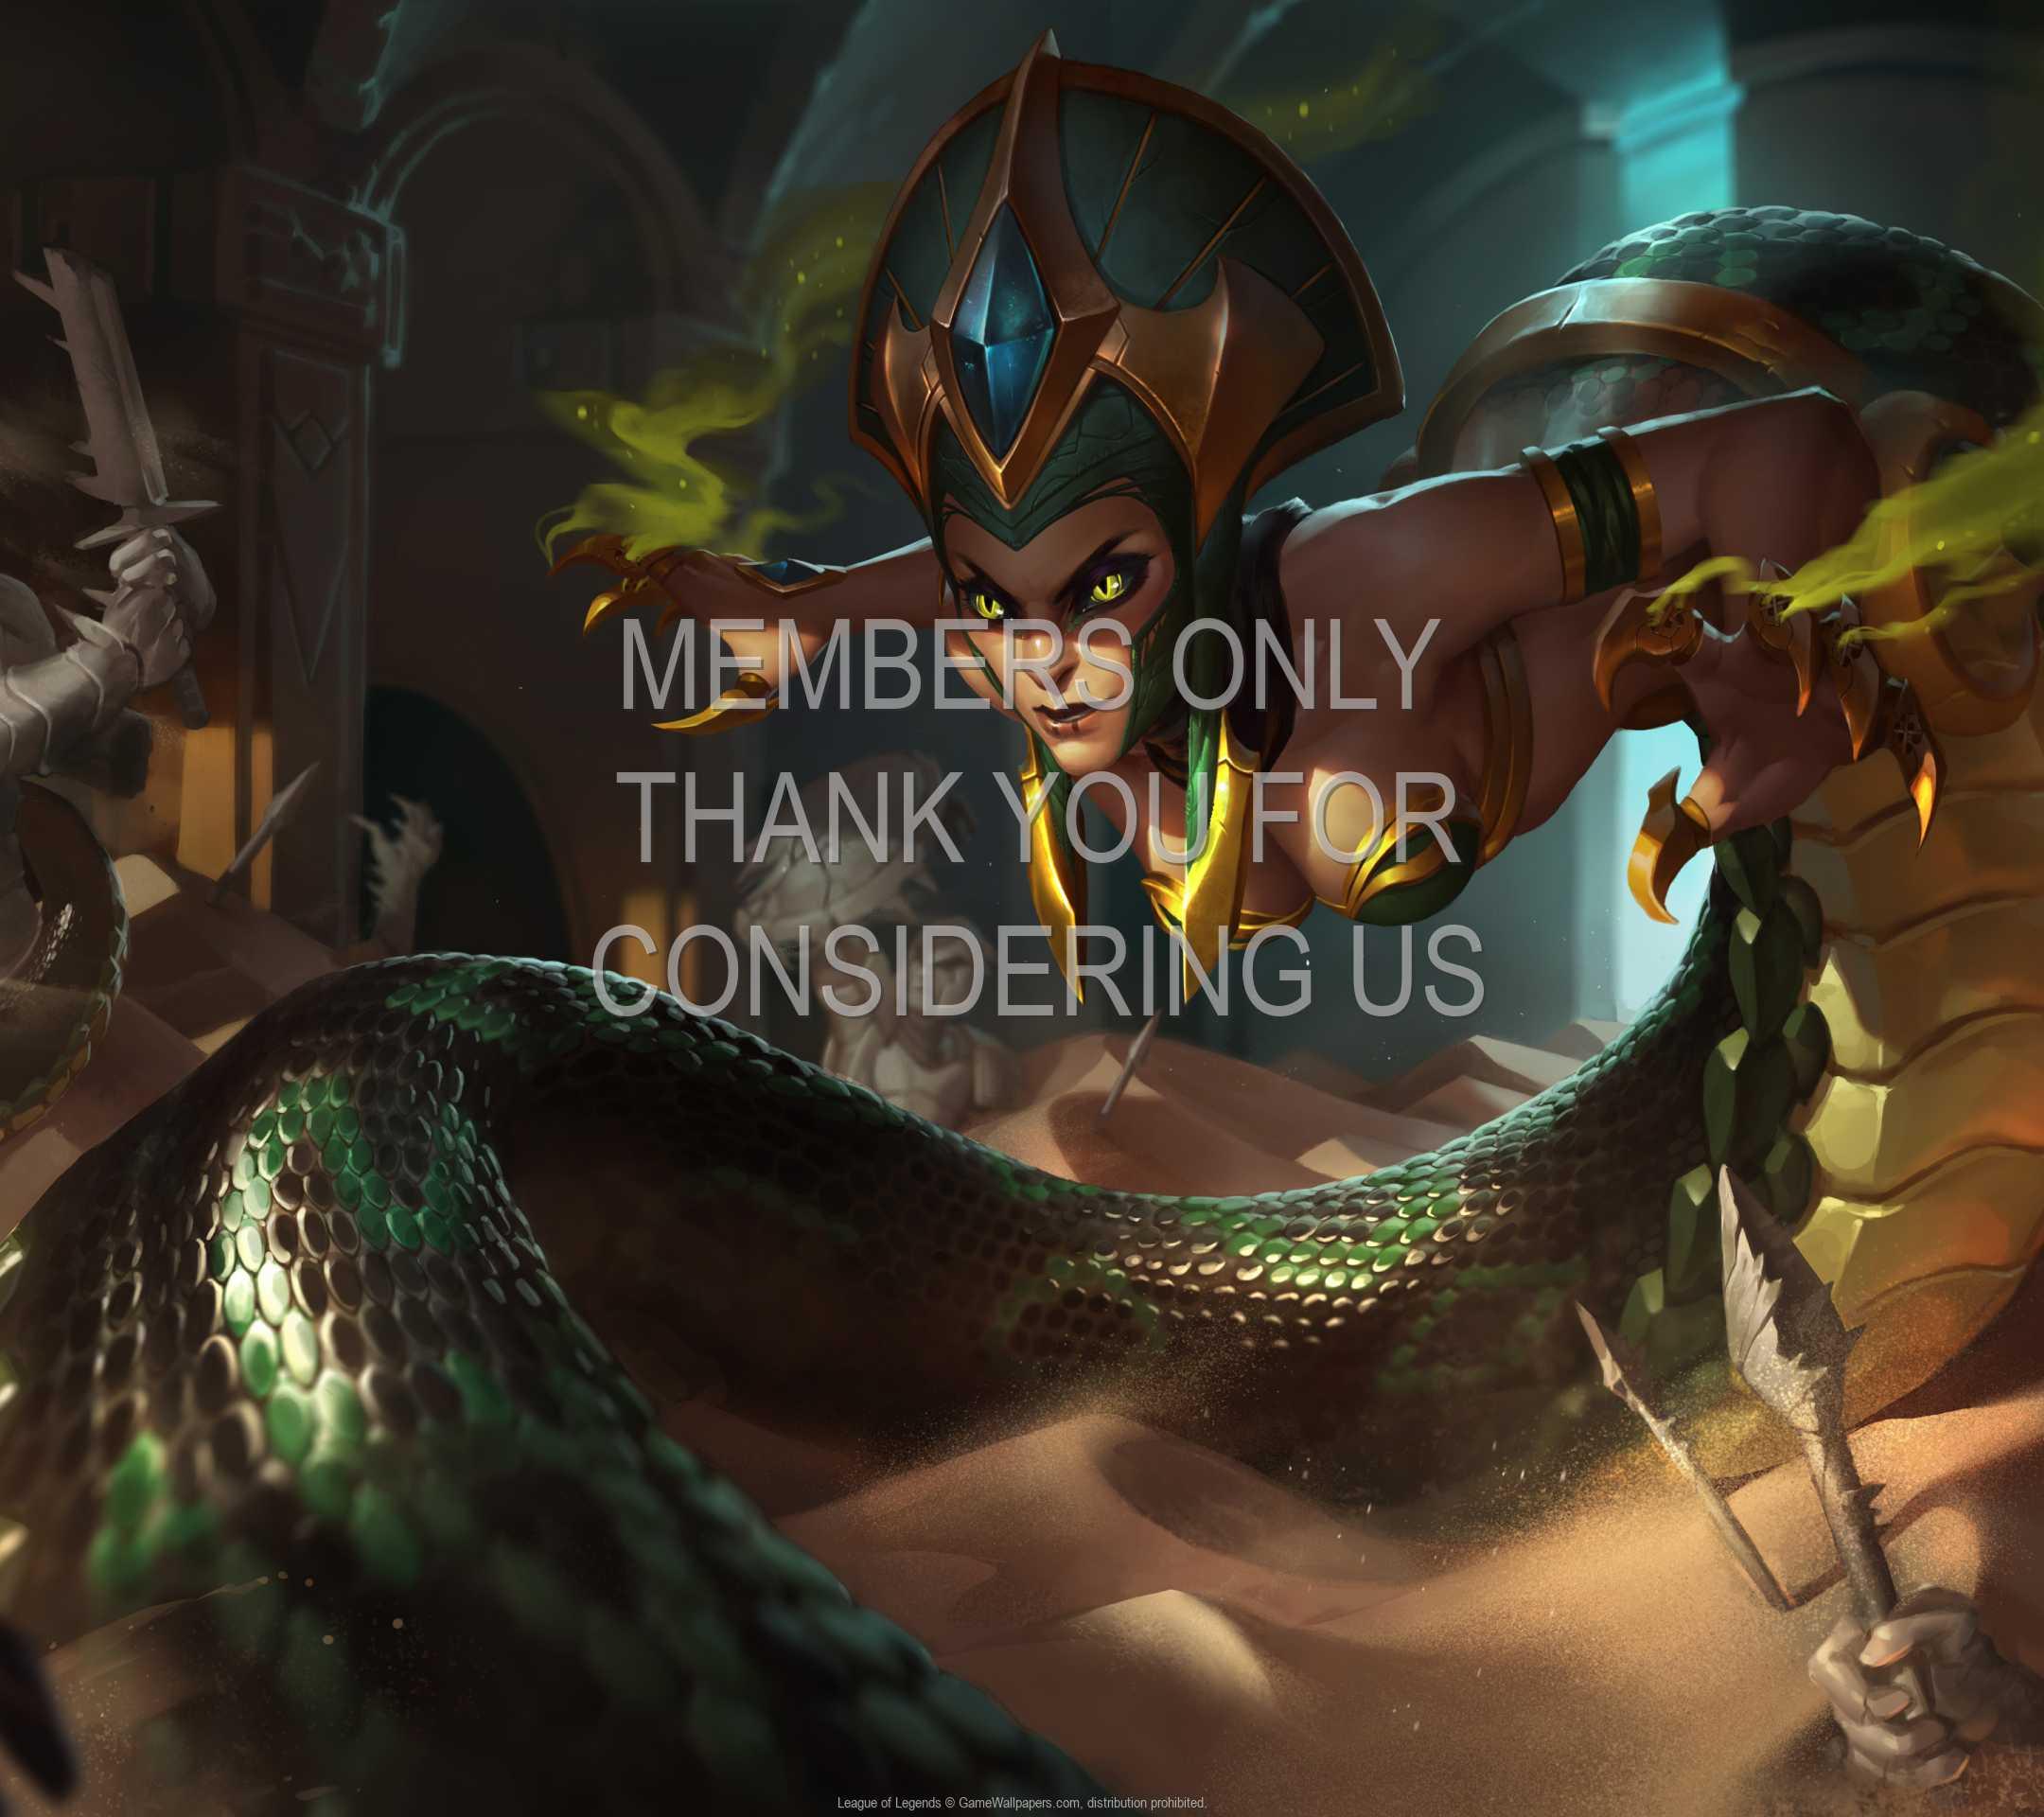 League of Legends 1080p Horizontal Handy Hintergrundbild 48